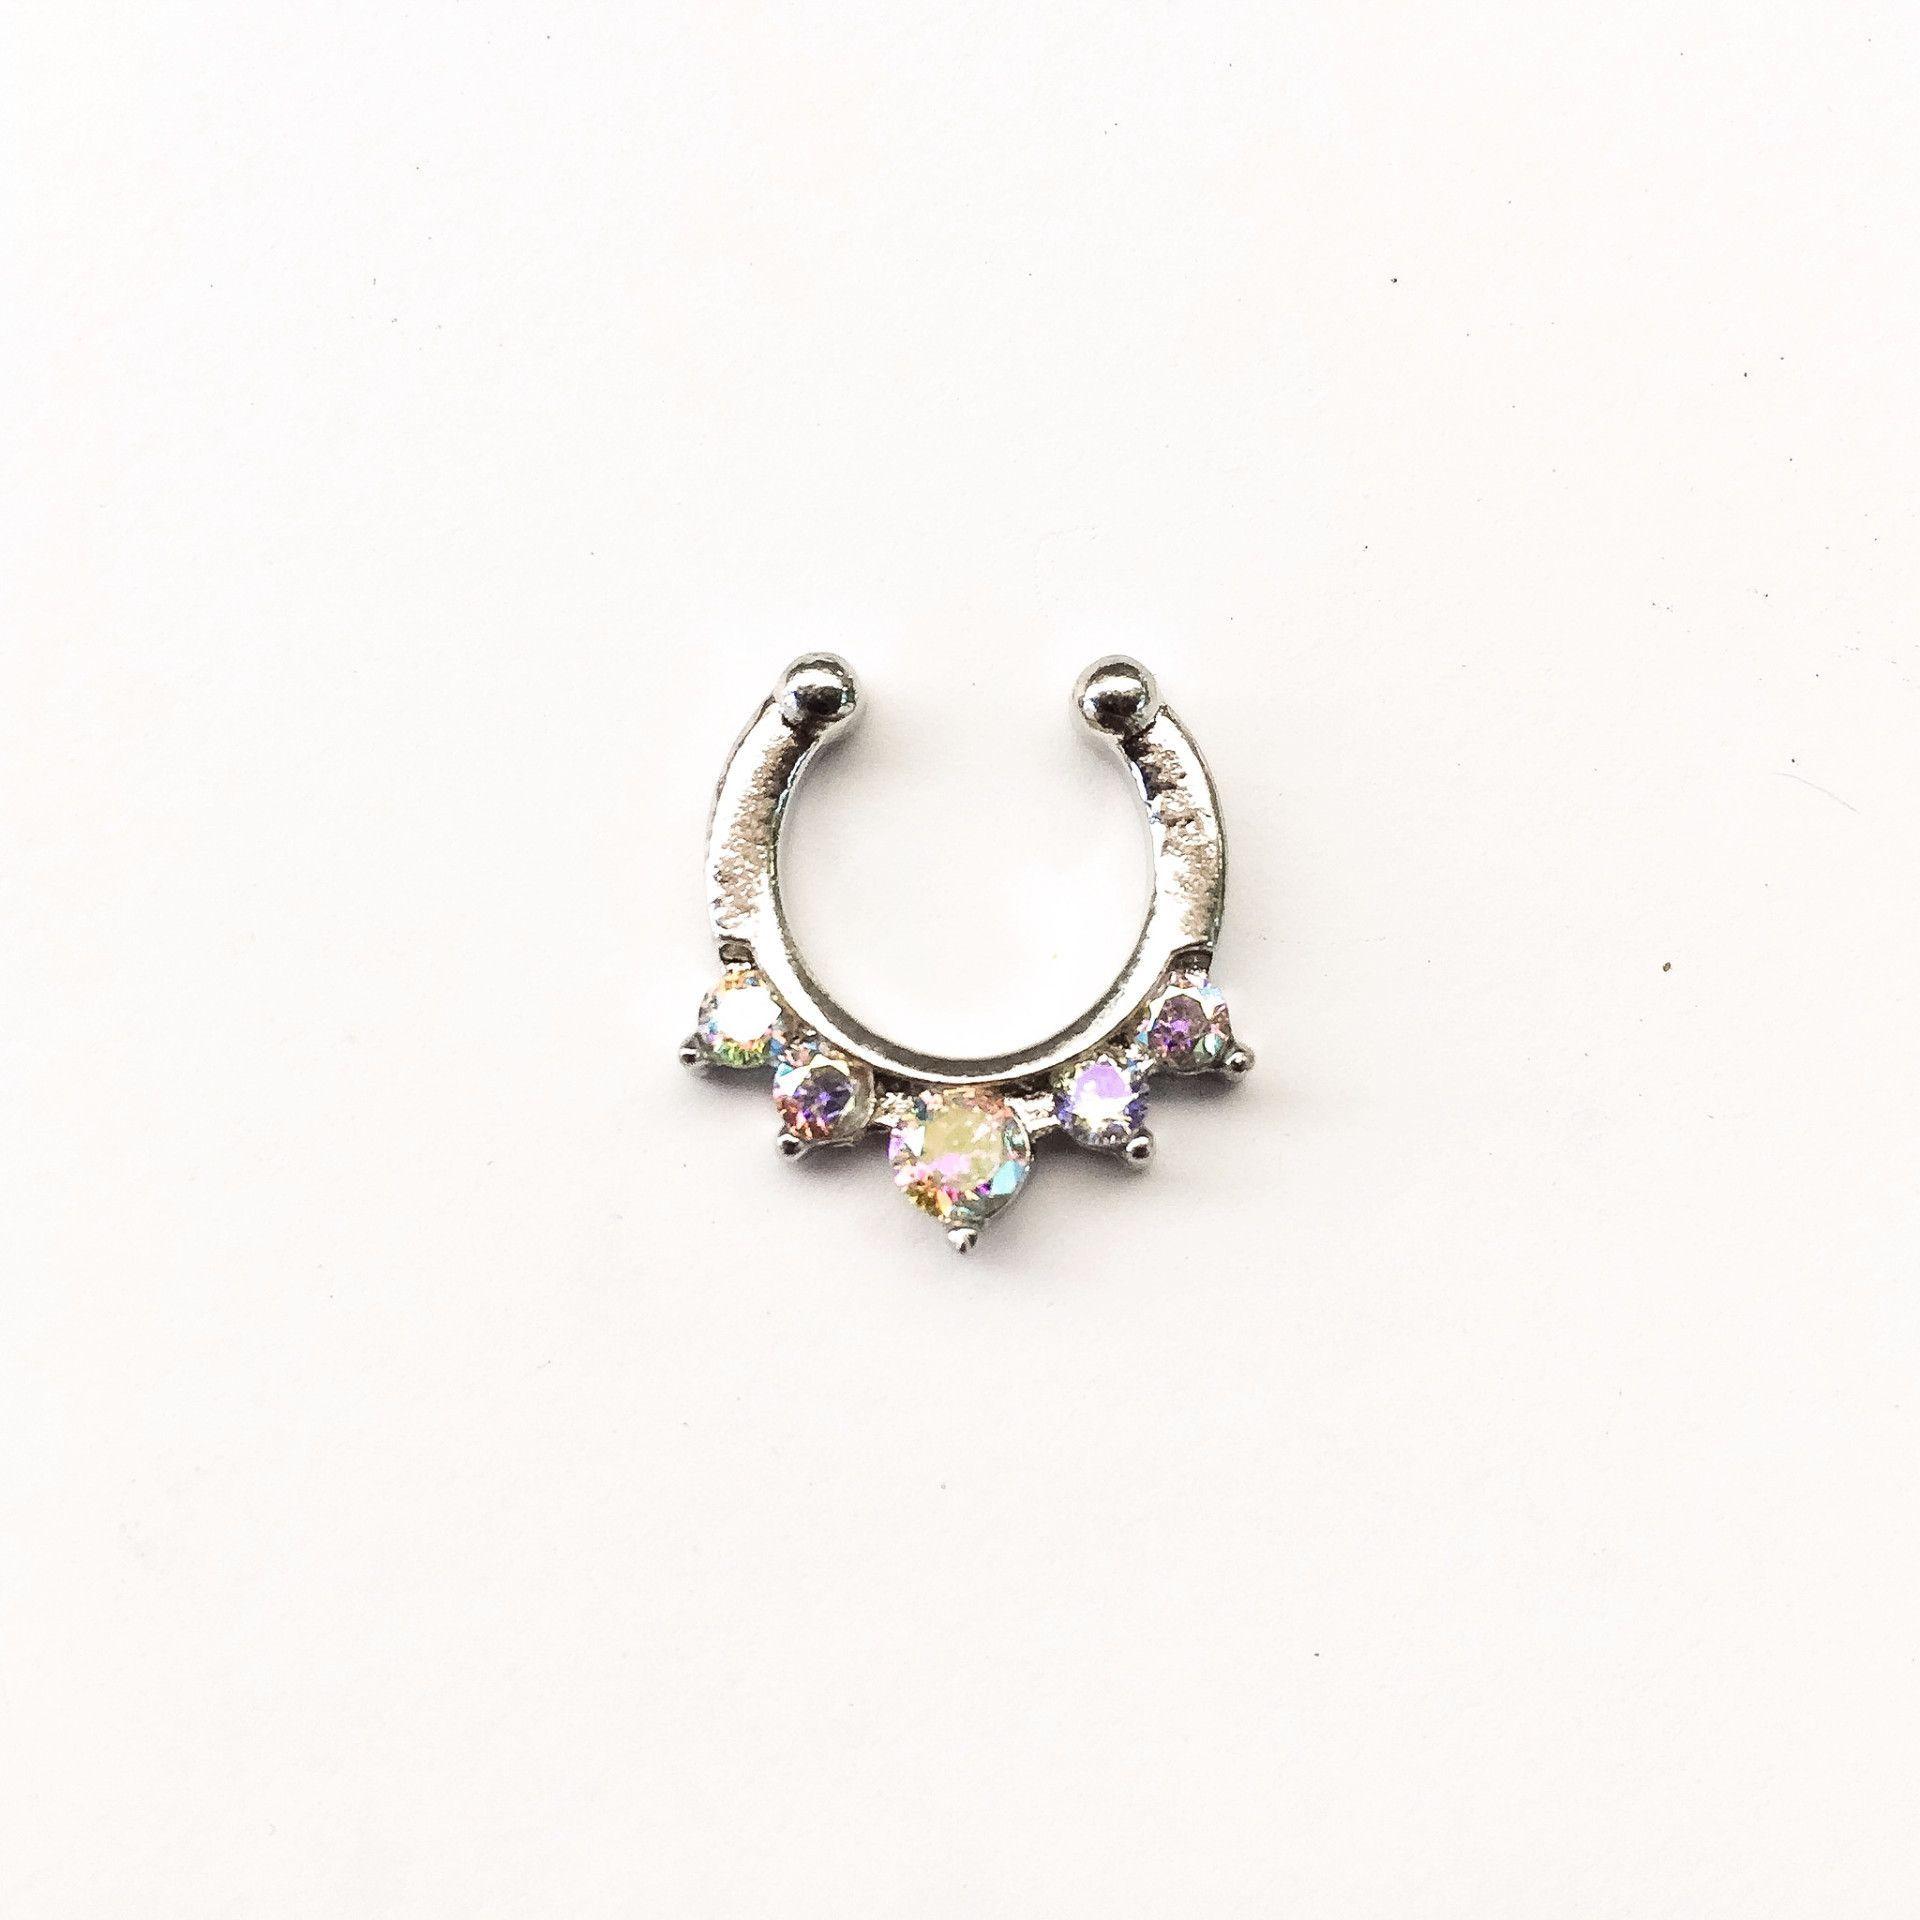 Nose piercing earrings  Faux Septum Rings  Faux septum ring Septum and Ring